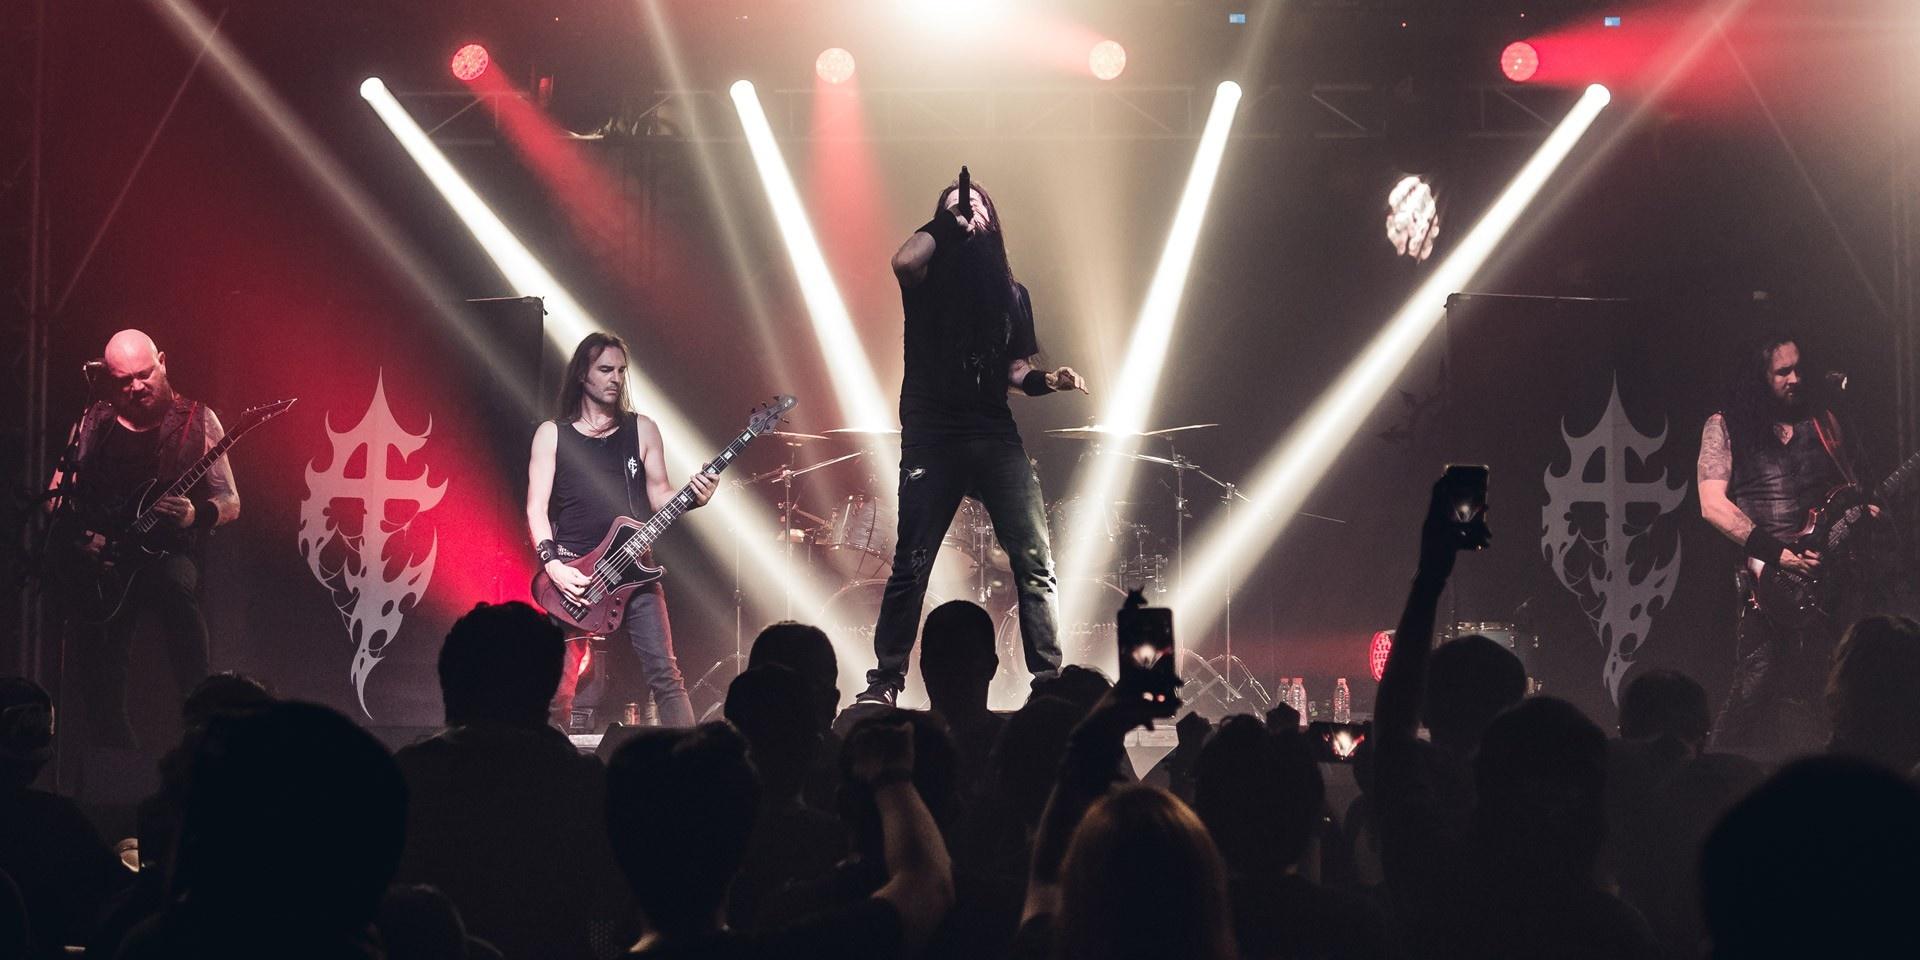 Sinsaenum take on Manila with intimate concert – photo gallery